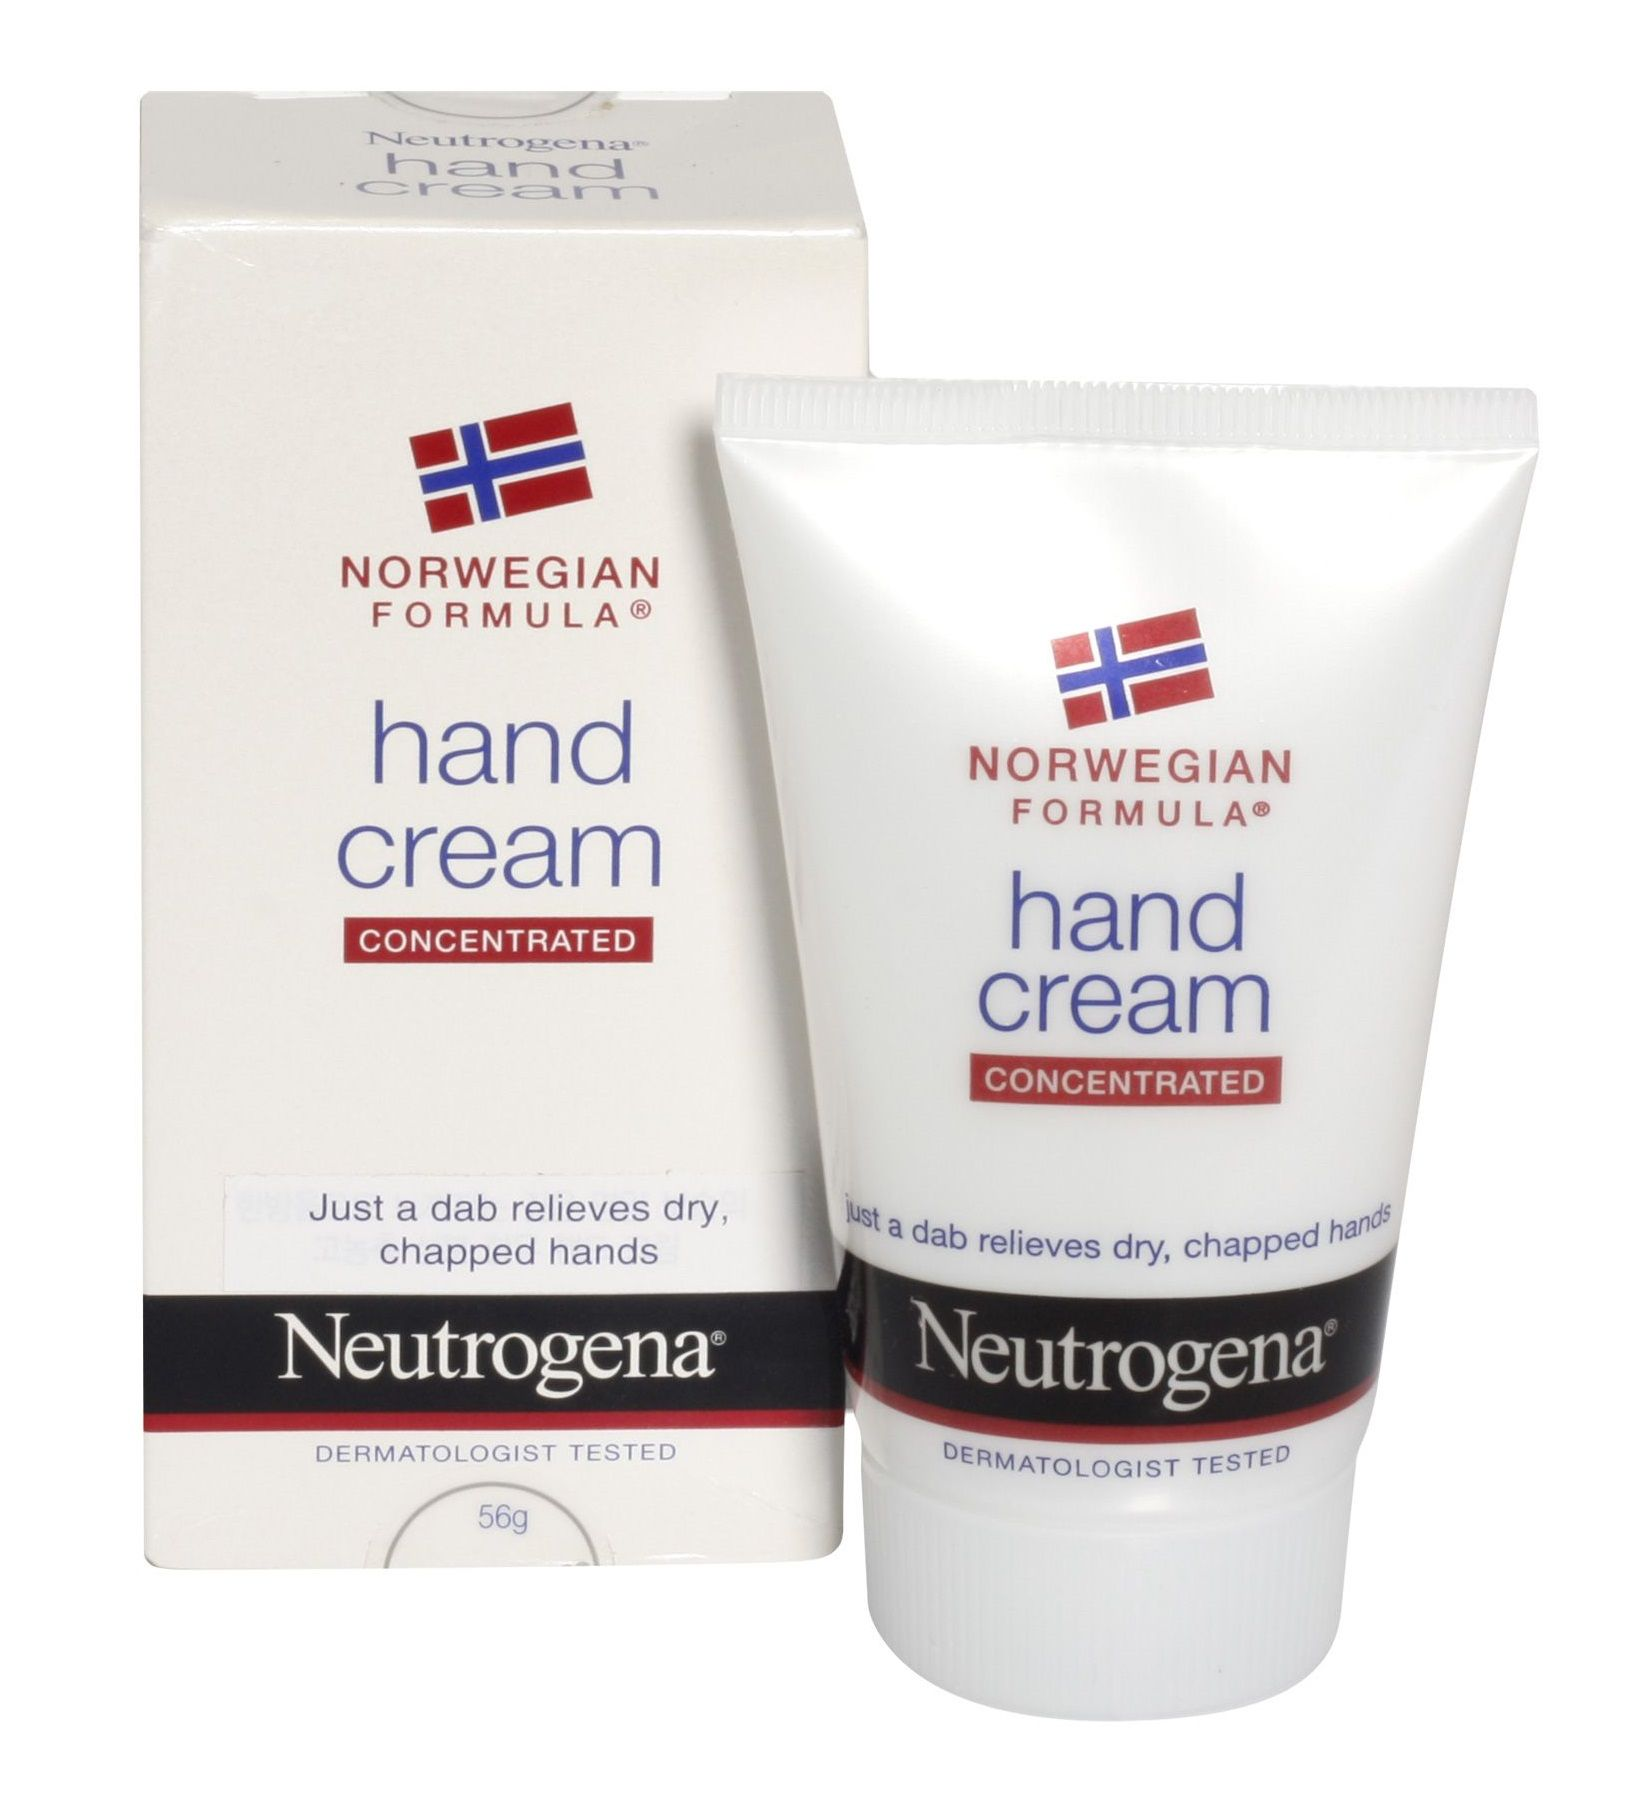 fdd773c4387 Neutrogena Norwegian Formula Hand Cream(56gm)